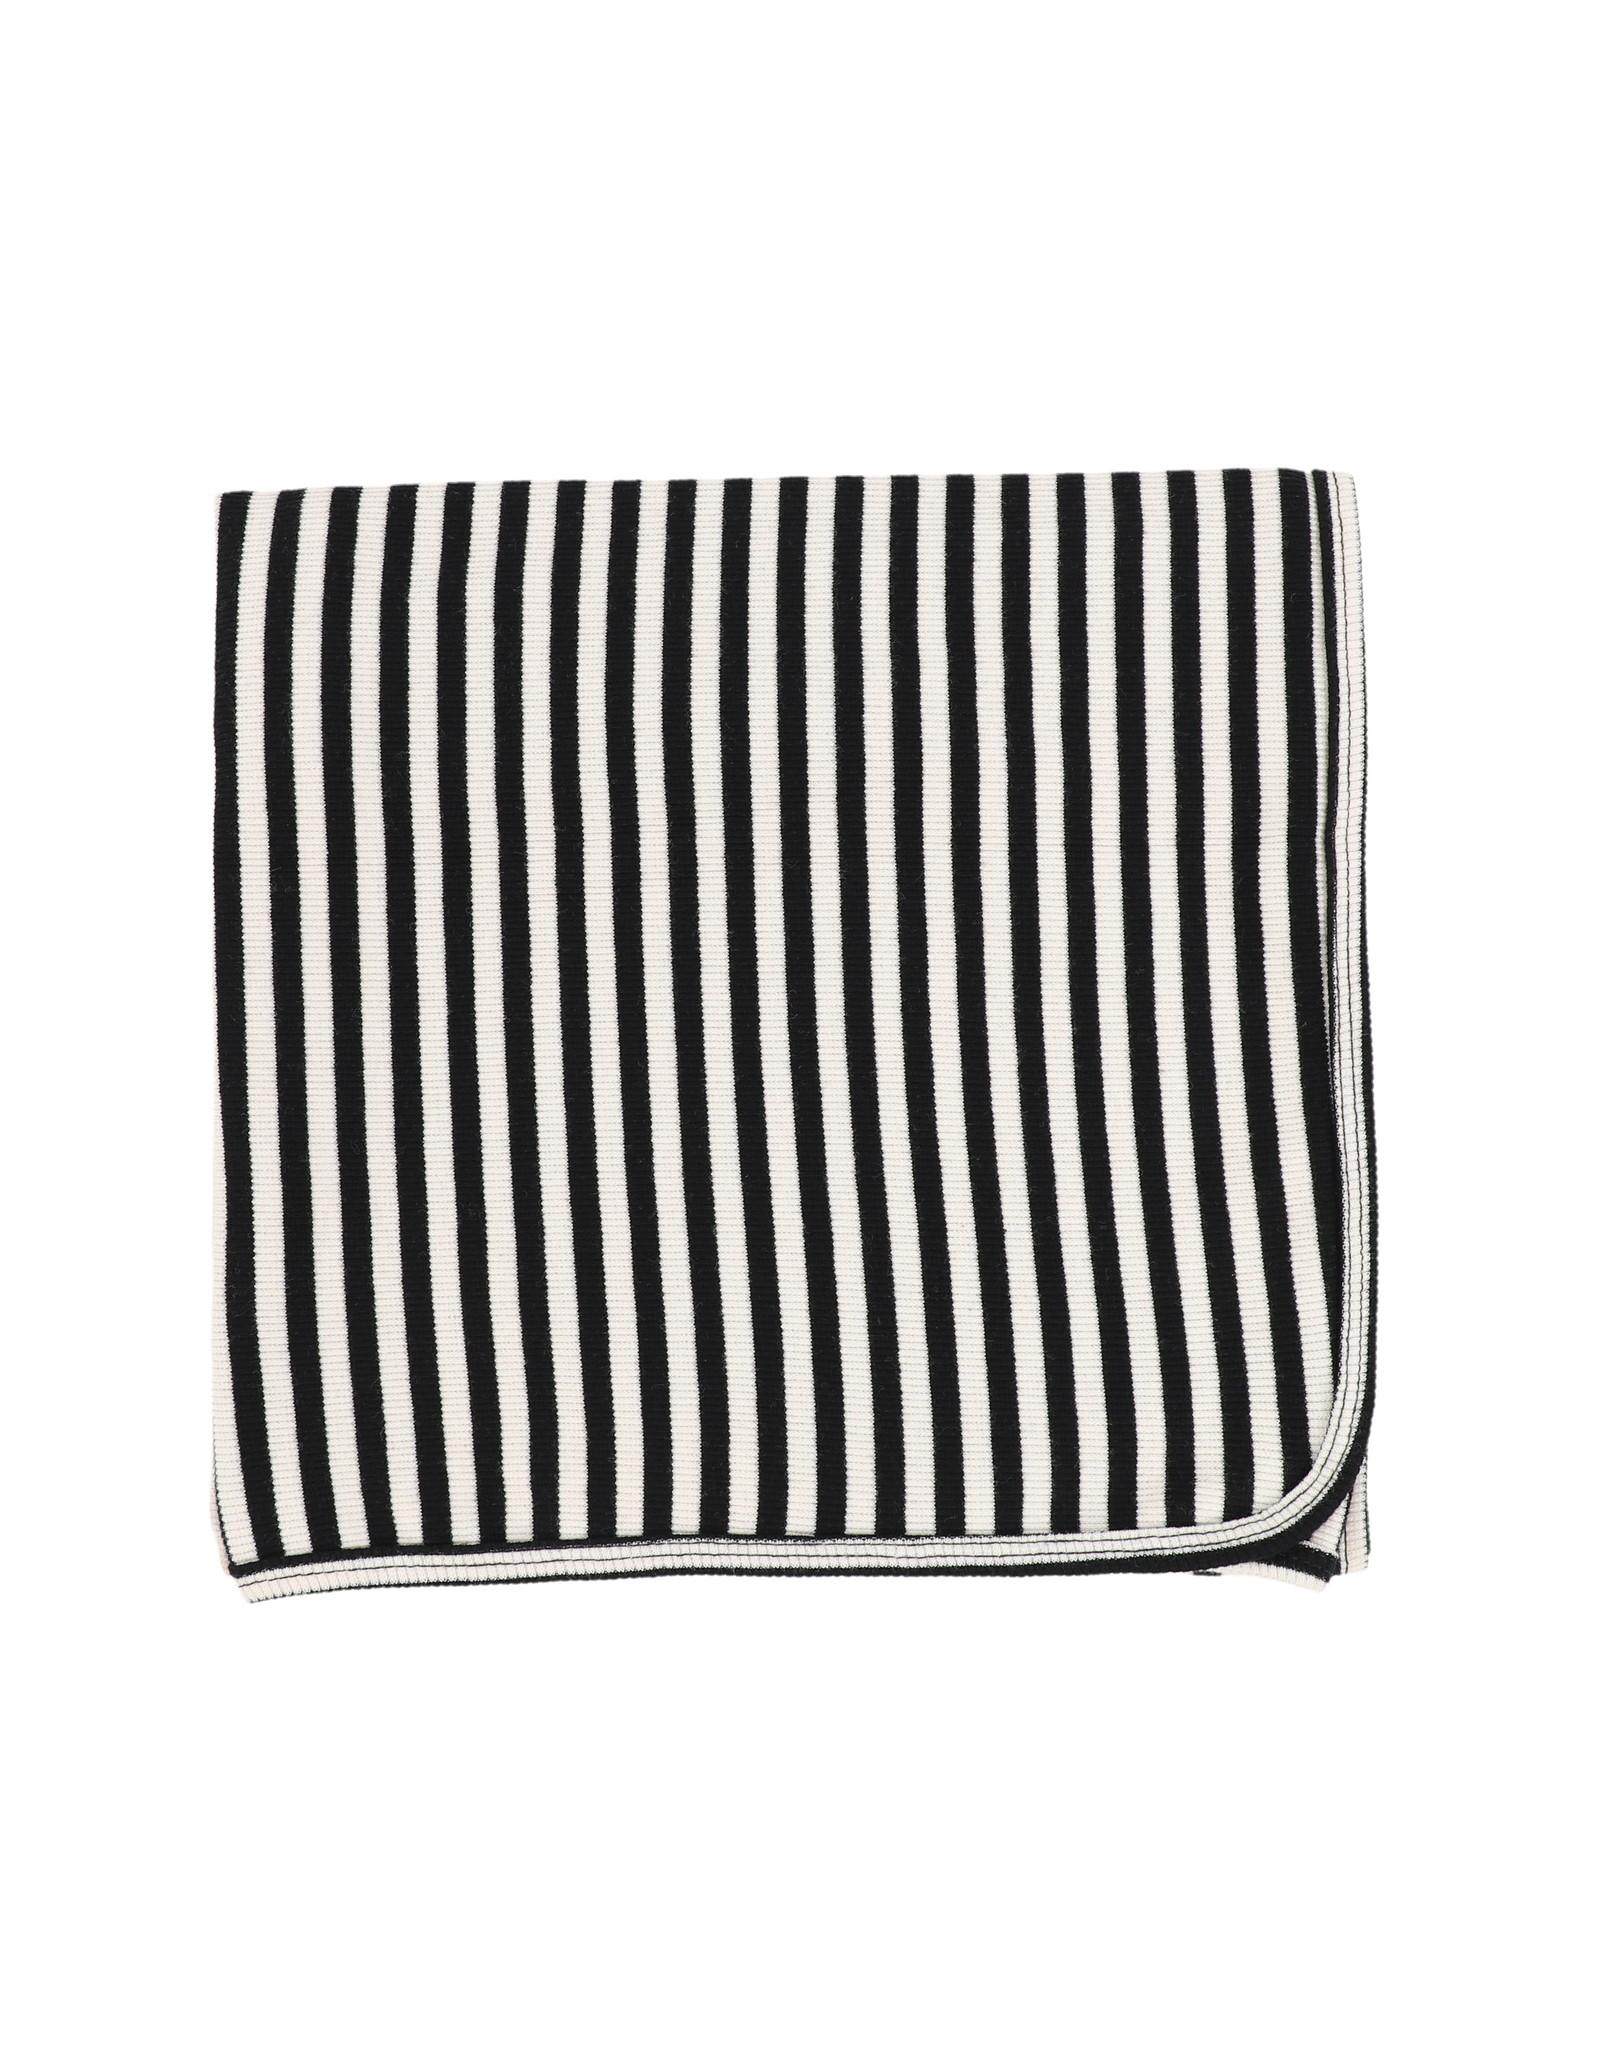 LIL LEGS FW21 Stripe Classic Ribbed Blanket